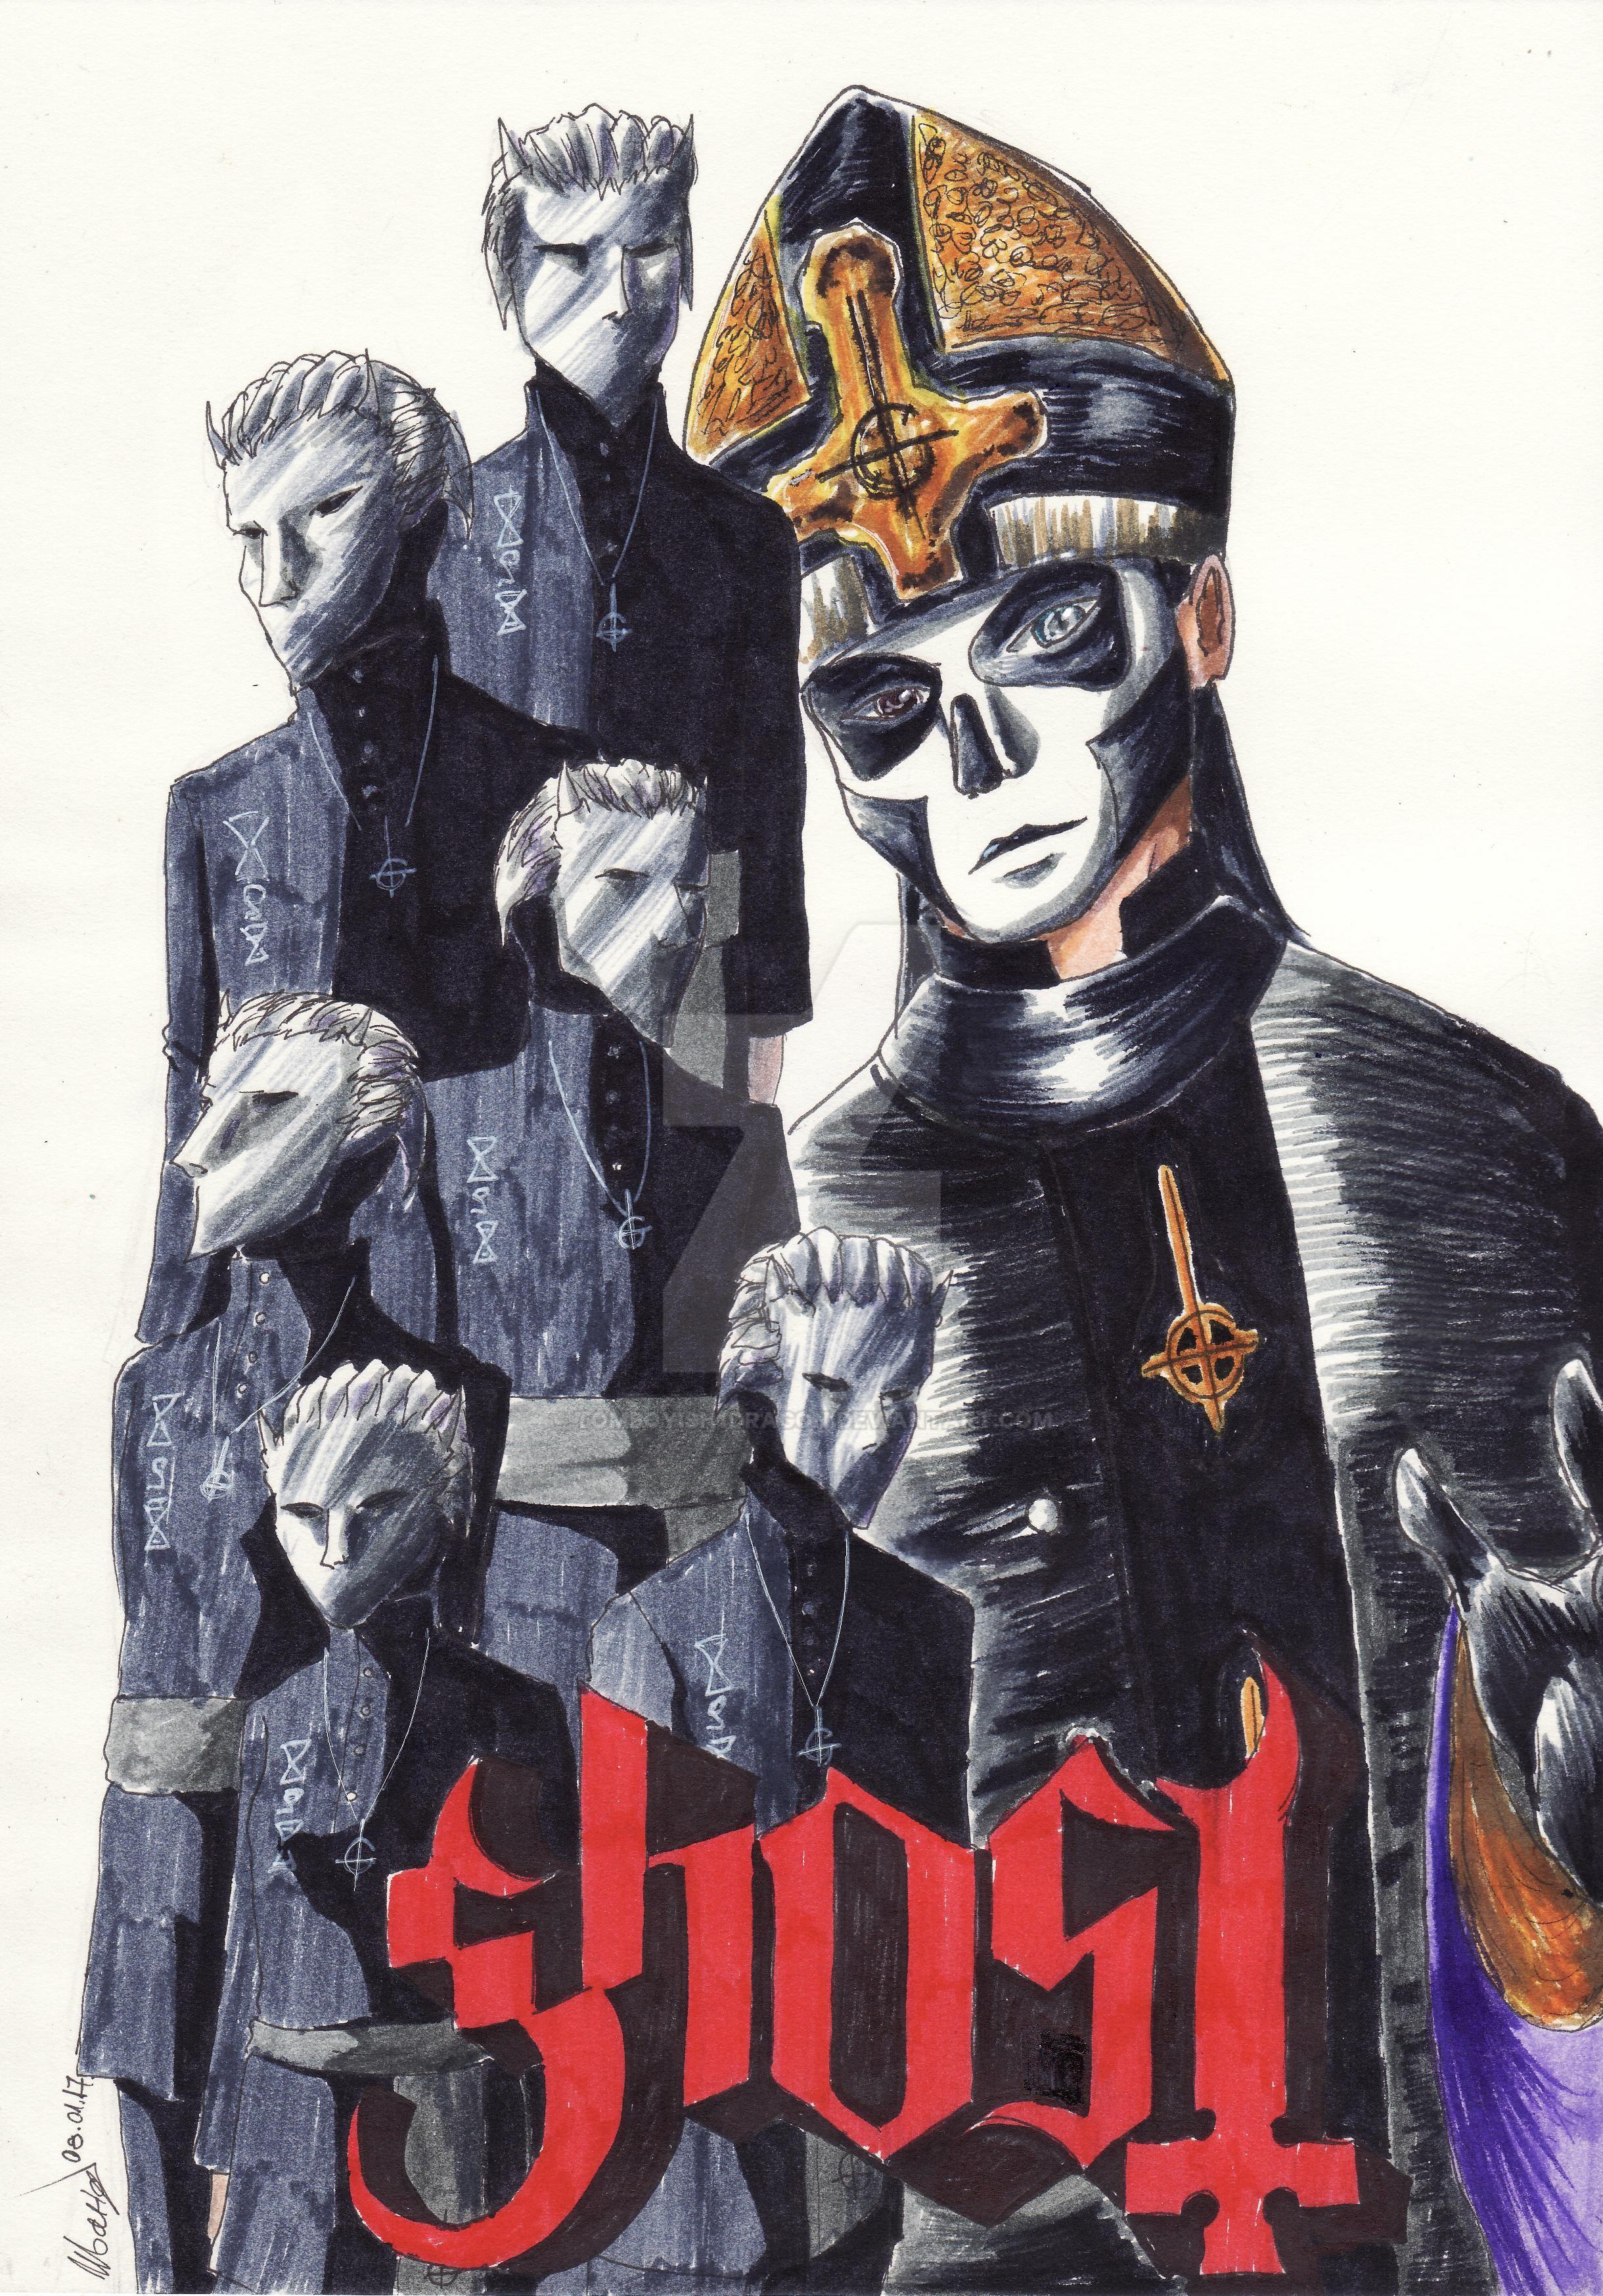 Ghost Manga Cover by tomboyish1dragon